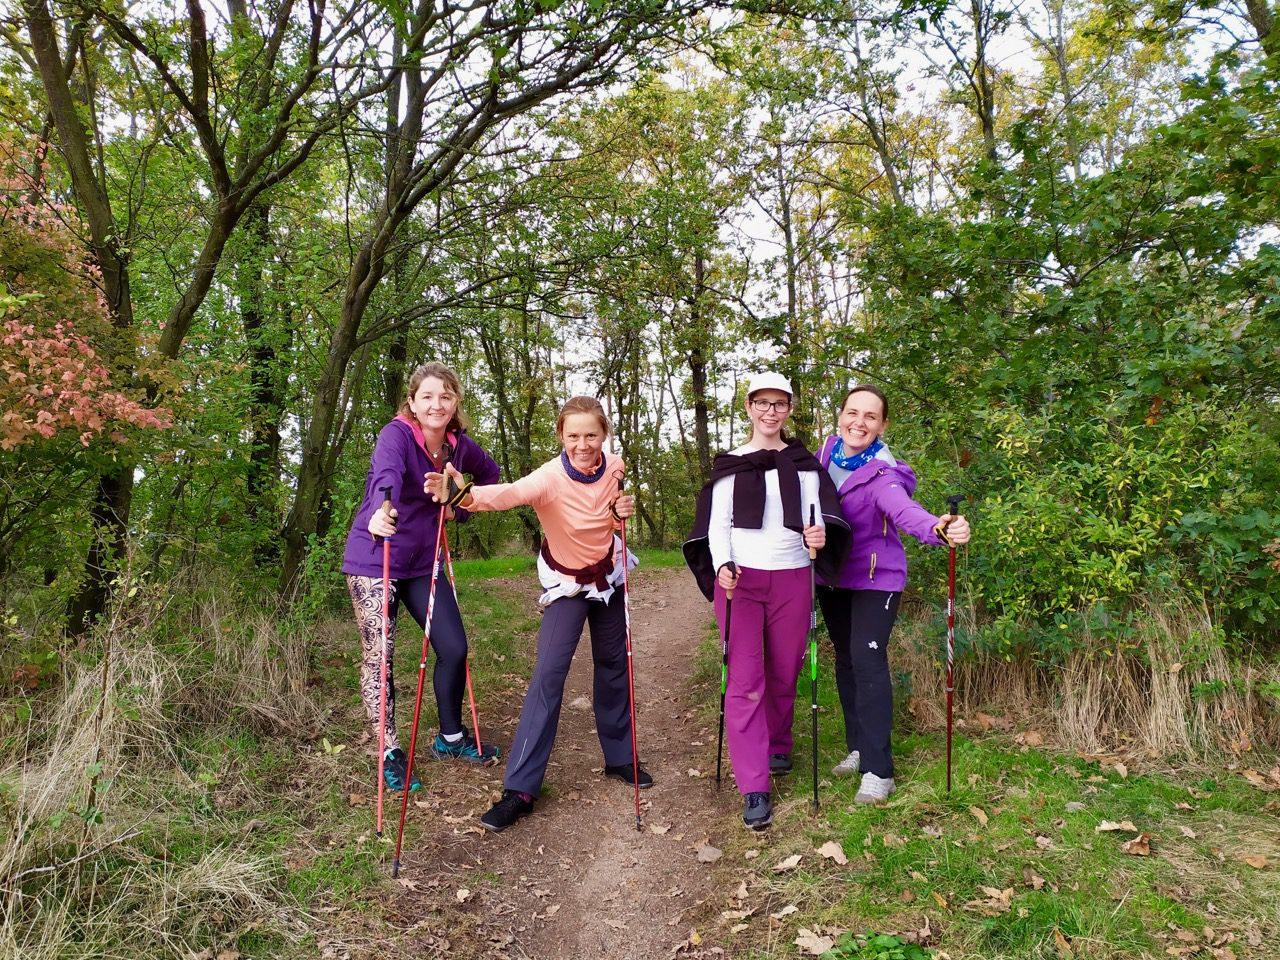 Nordic walking kurz 12.10.2019, Brno